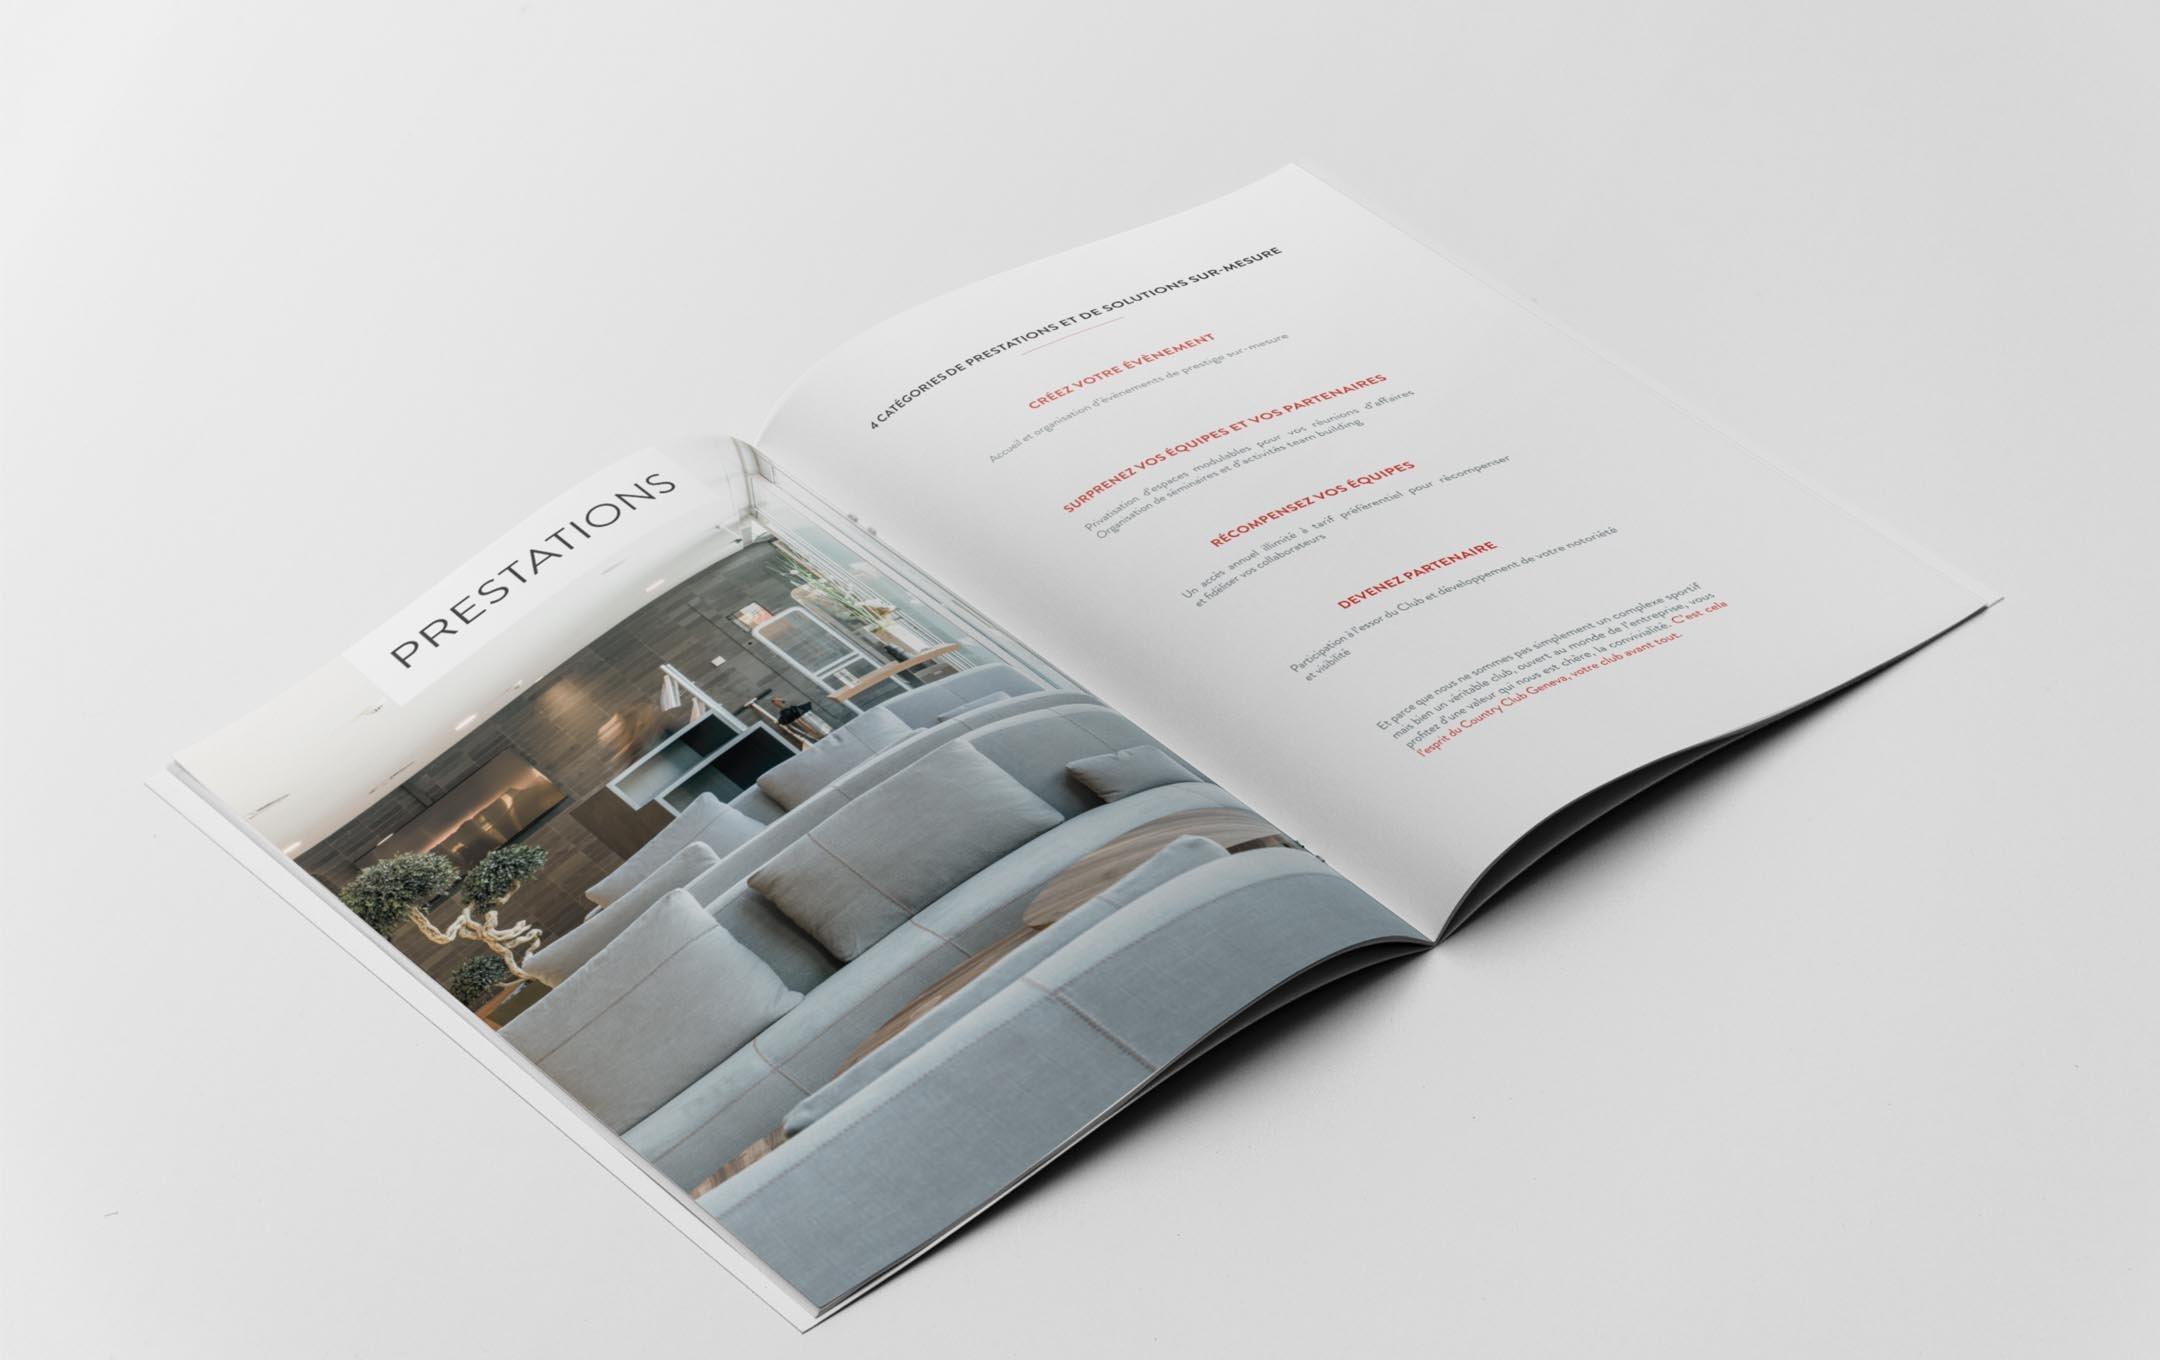 Habefast Etude De Cas Ccg Print Brochure Mice 02